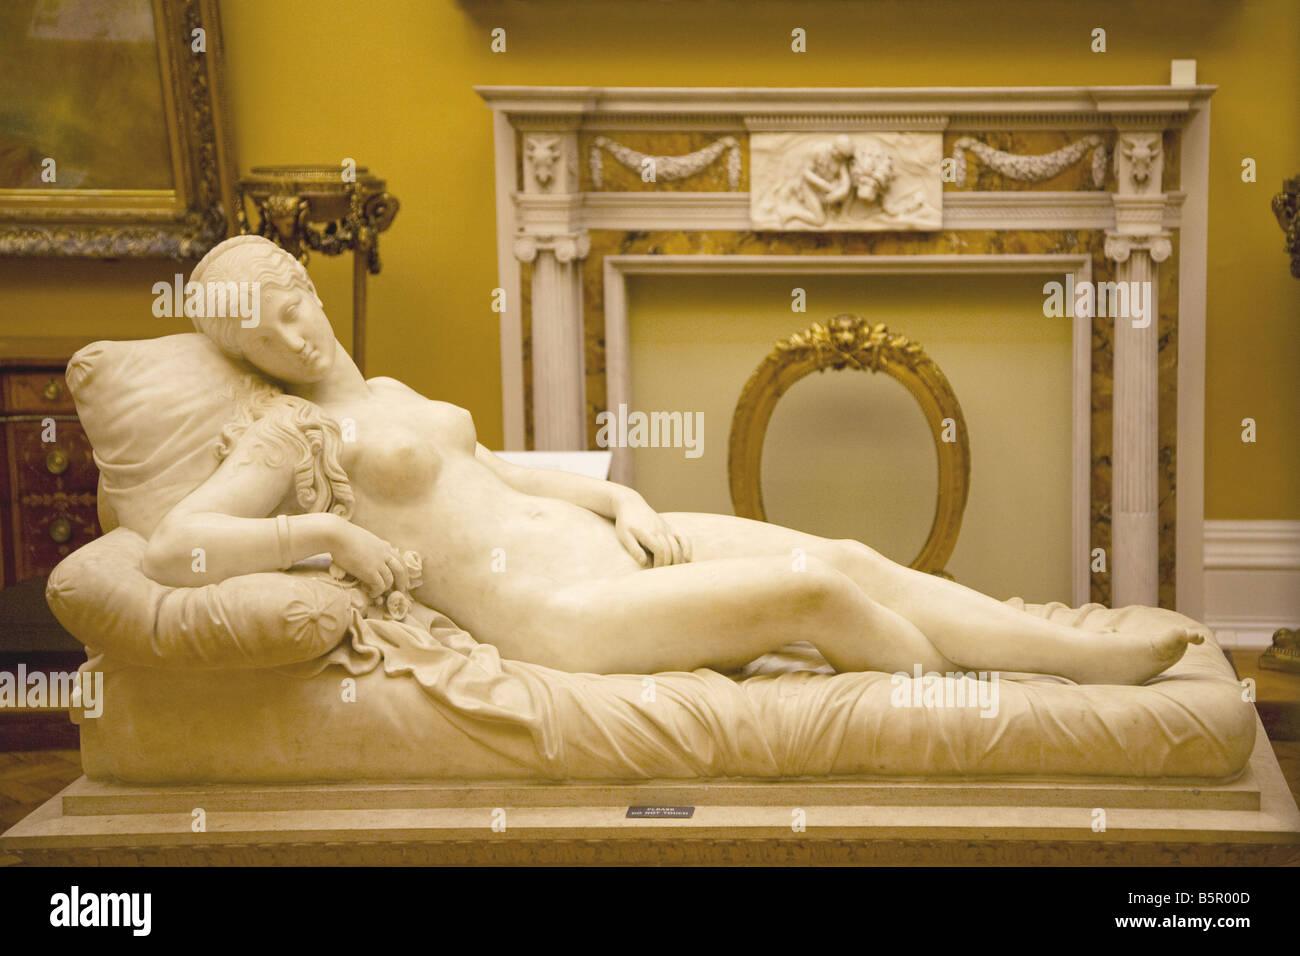 Venus after Lorenzo Bartolini interior of Lady Lever Gallery Port Sunlight Model Village Wirral Merseyside England - Stock Image